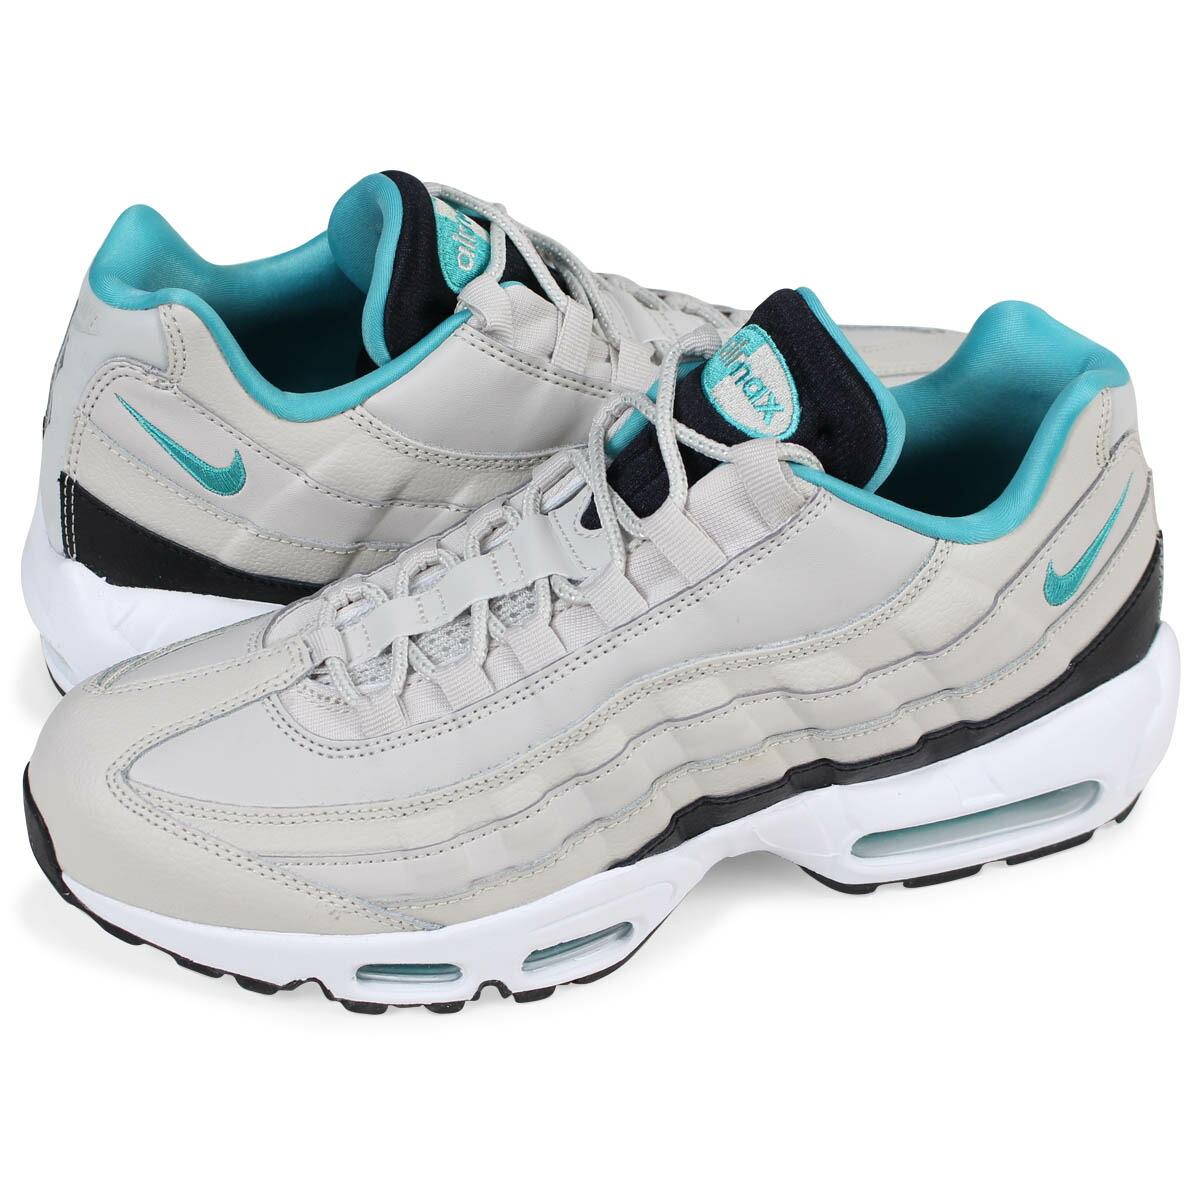 c5271b41058b Whats up Sports  Nike NIKE Air Max 95 essential sneakers men AIR MAX 95  ESSENTIAL 749